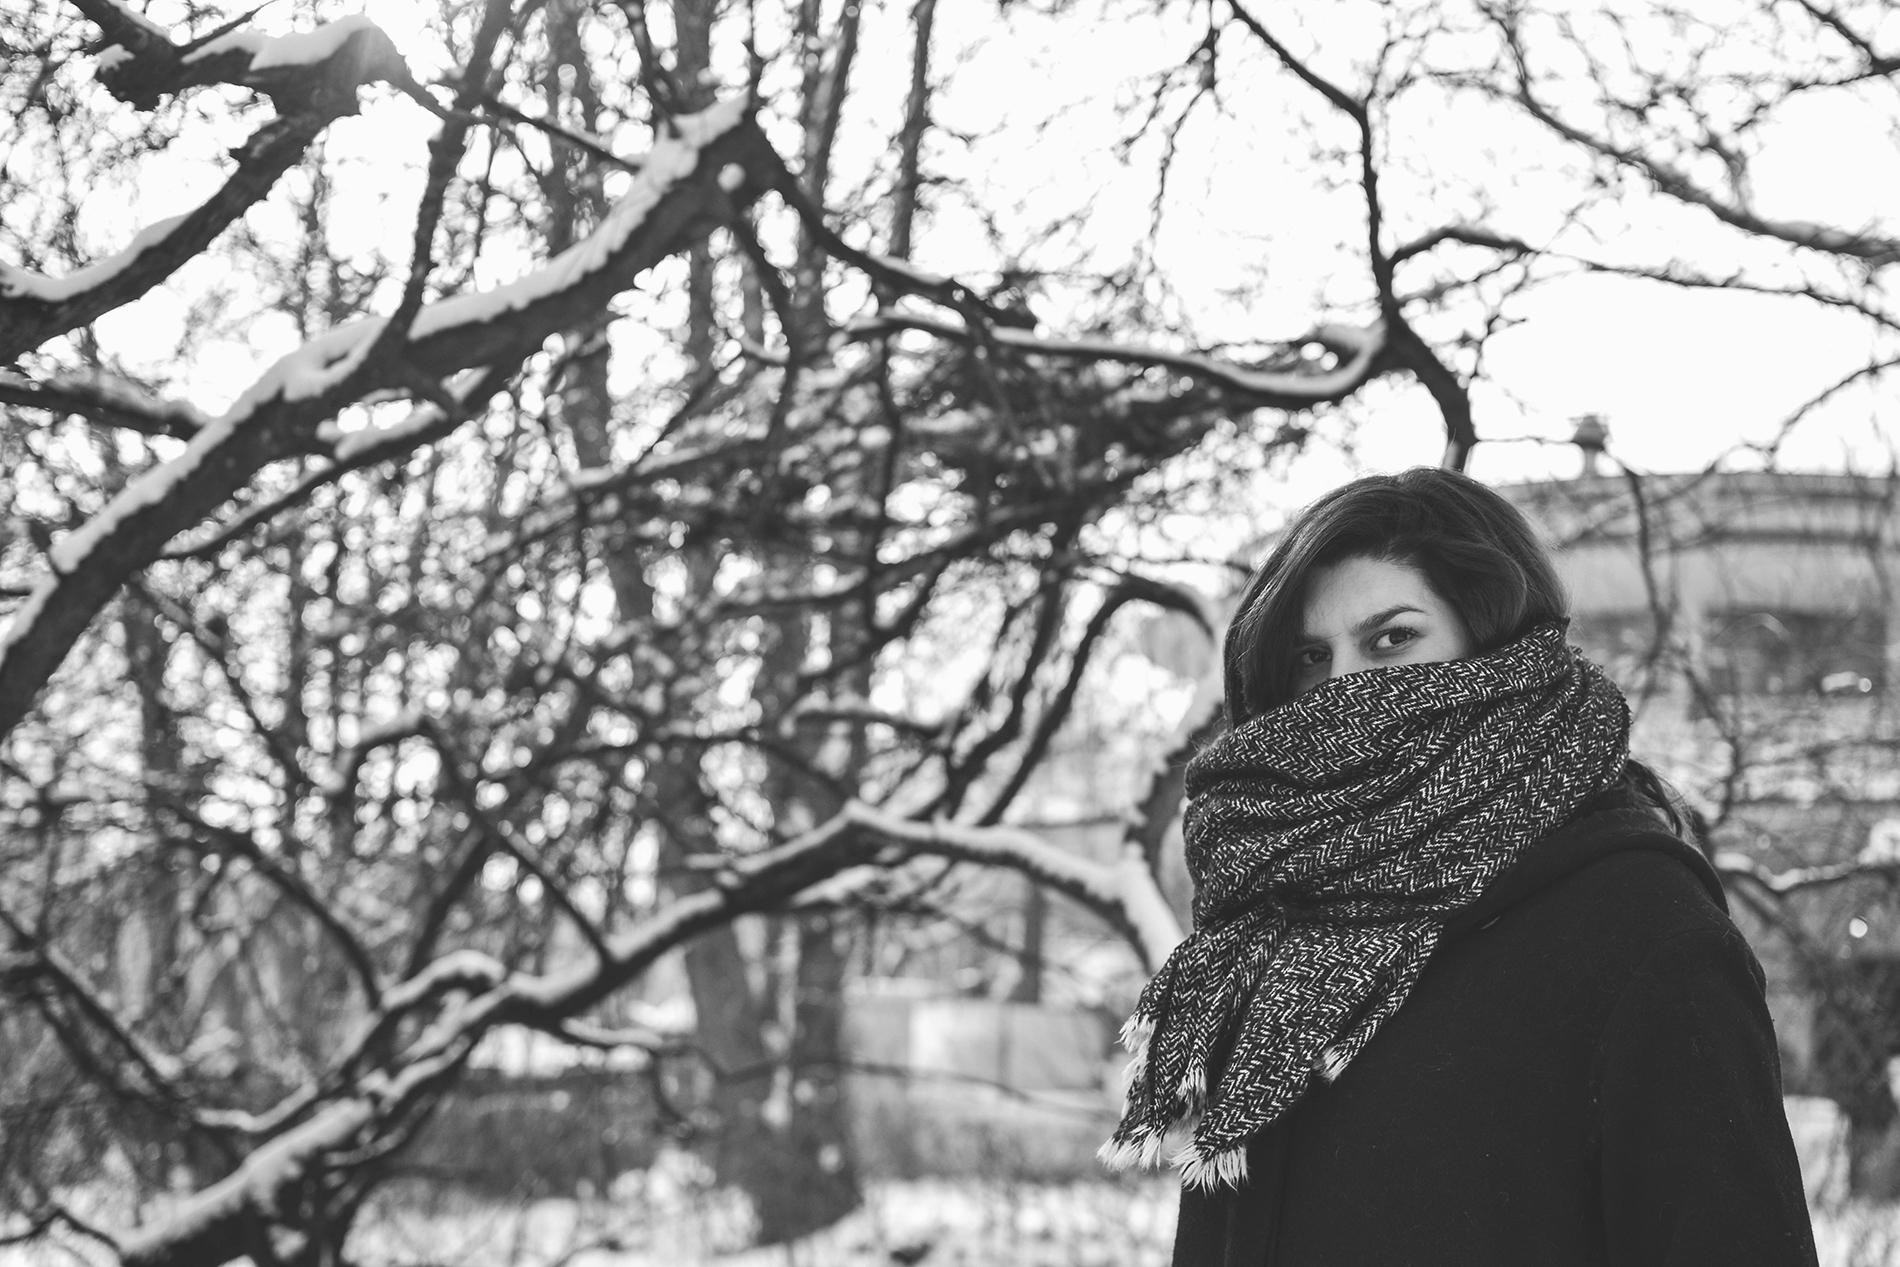 Paula Abrahao | Projeto 6 on 6: Maart 2017